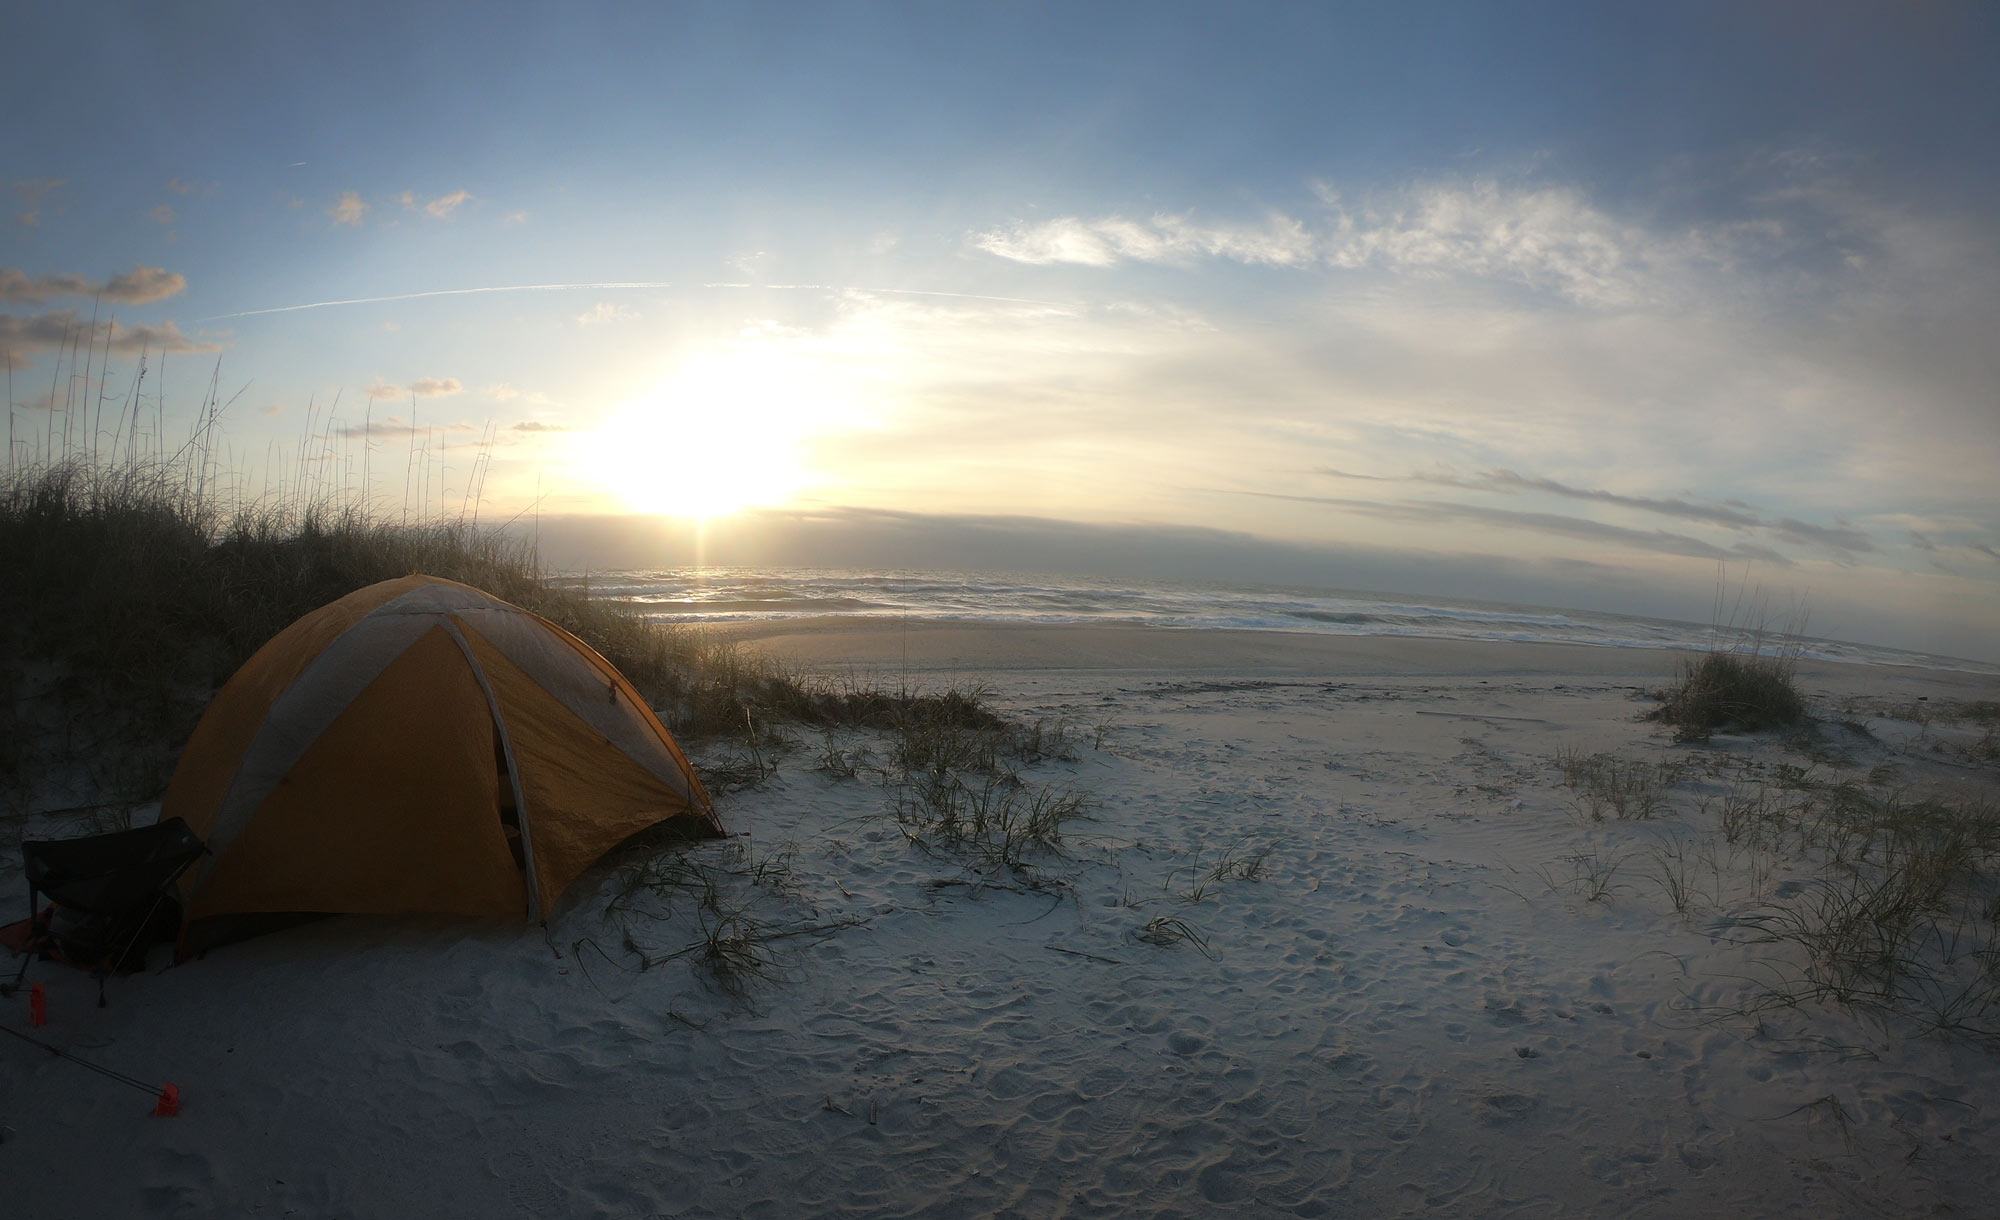 Camping on Masonboro Island, North Carolina